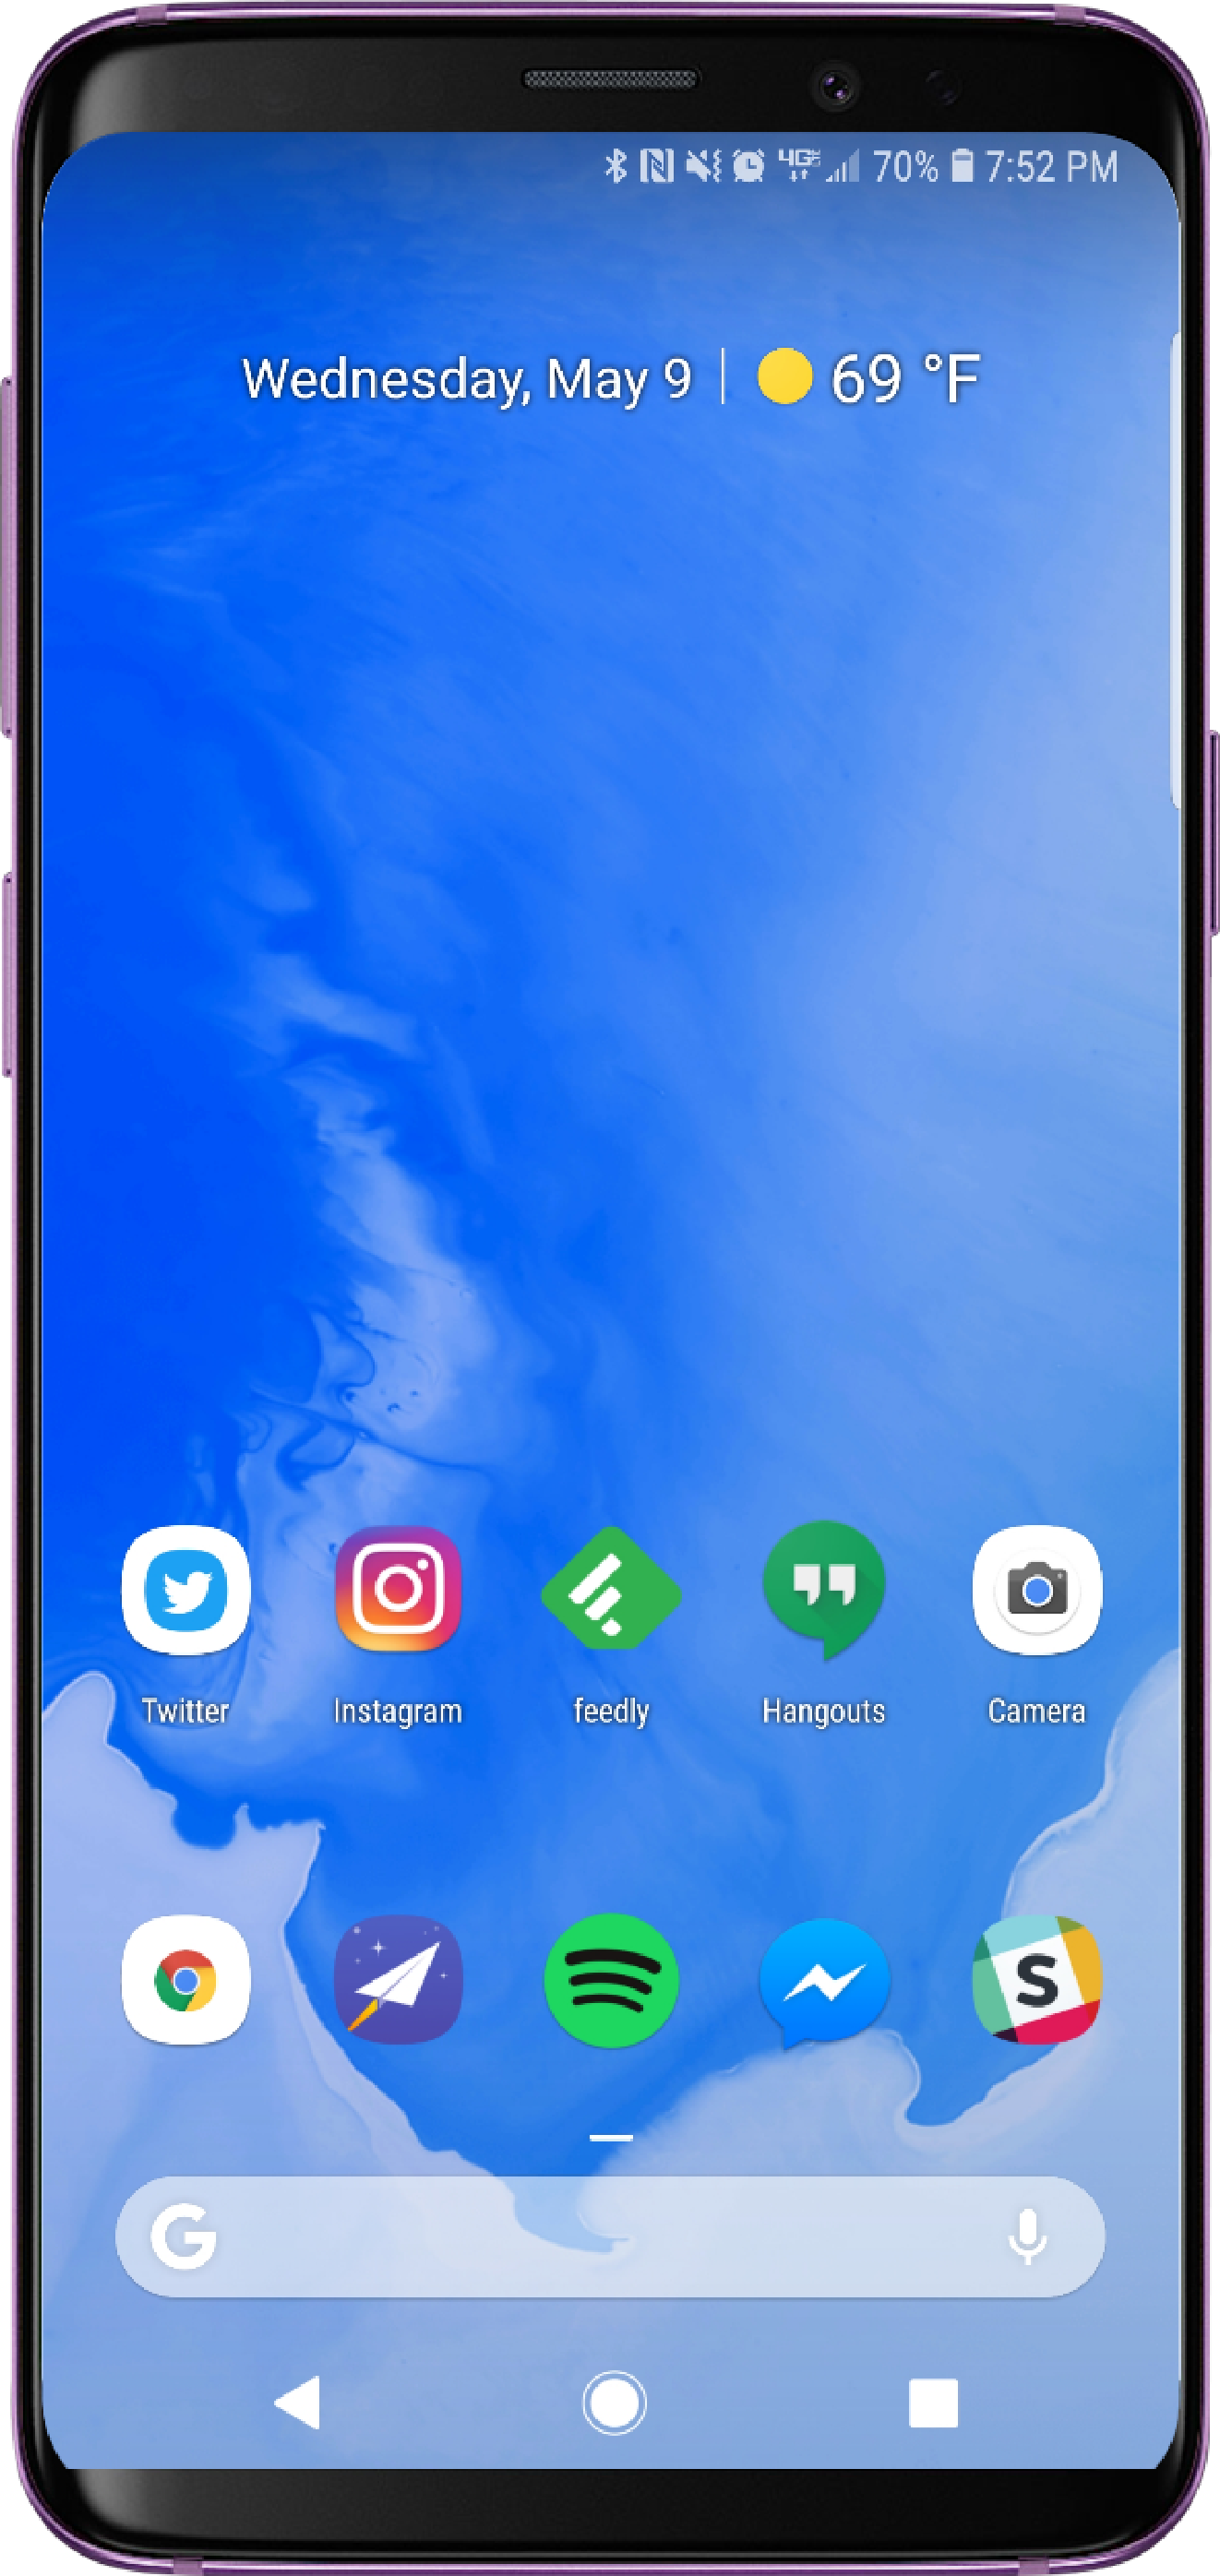 Download pixel launcher for android 7 0 | Download Pixel 2 Launcher